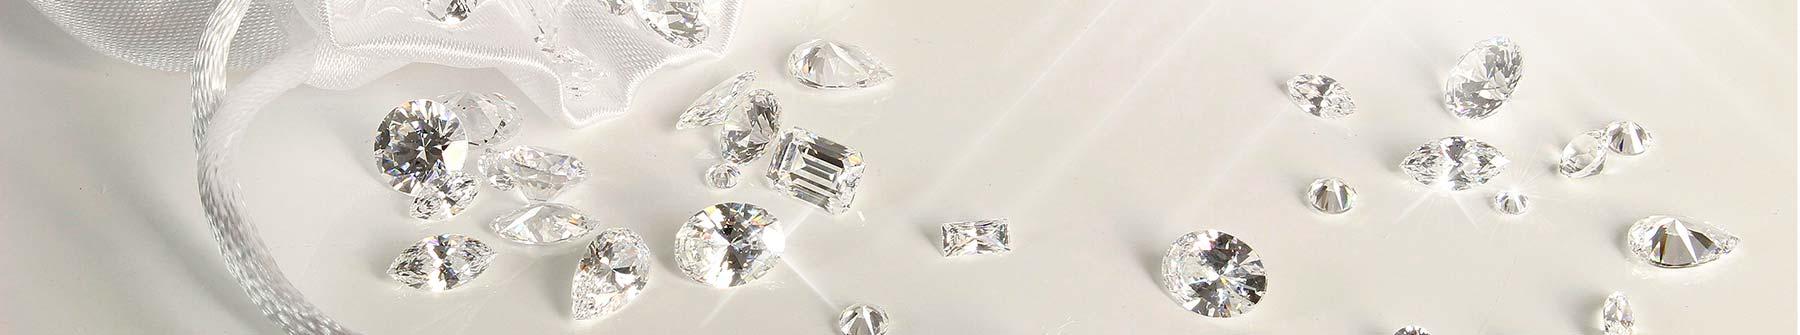 Swarovski Created Gemstones